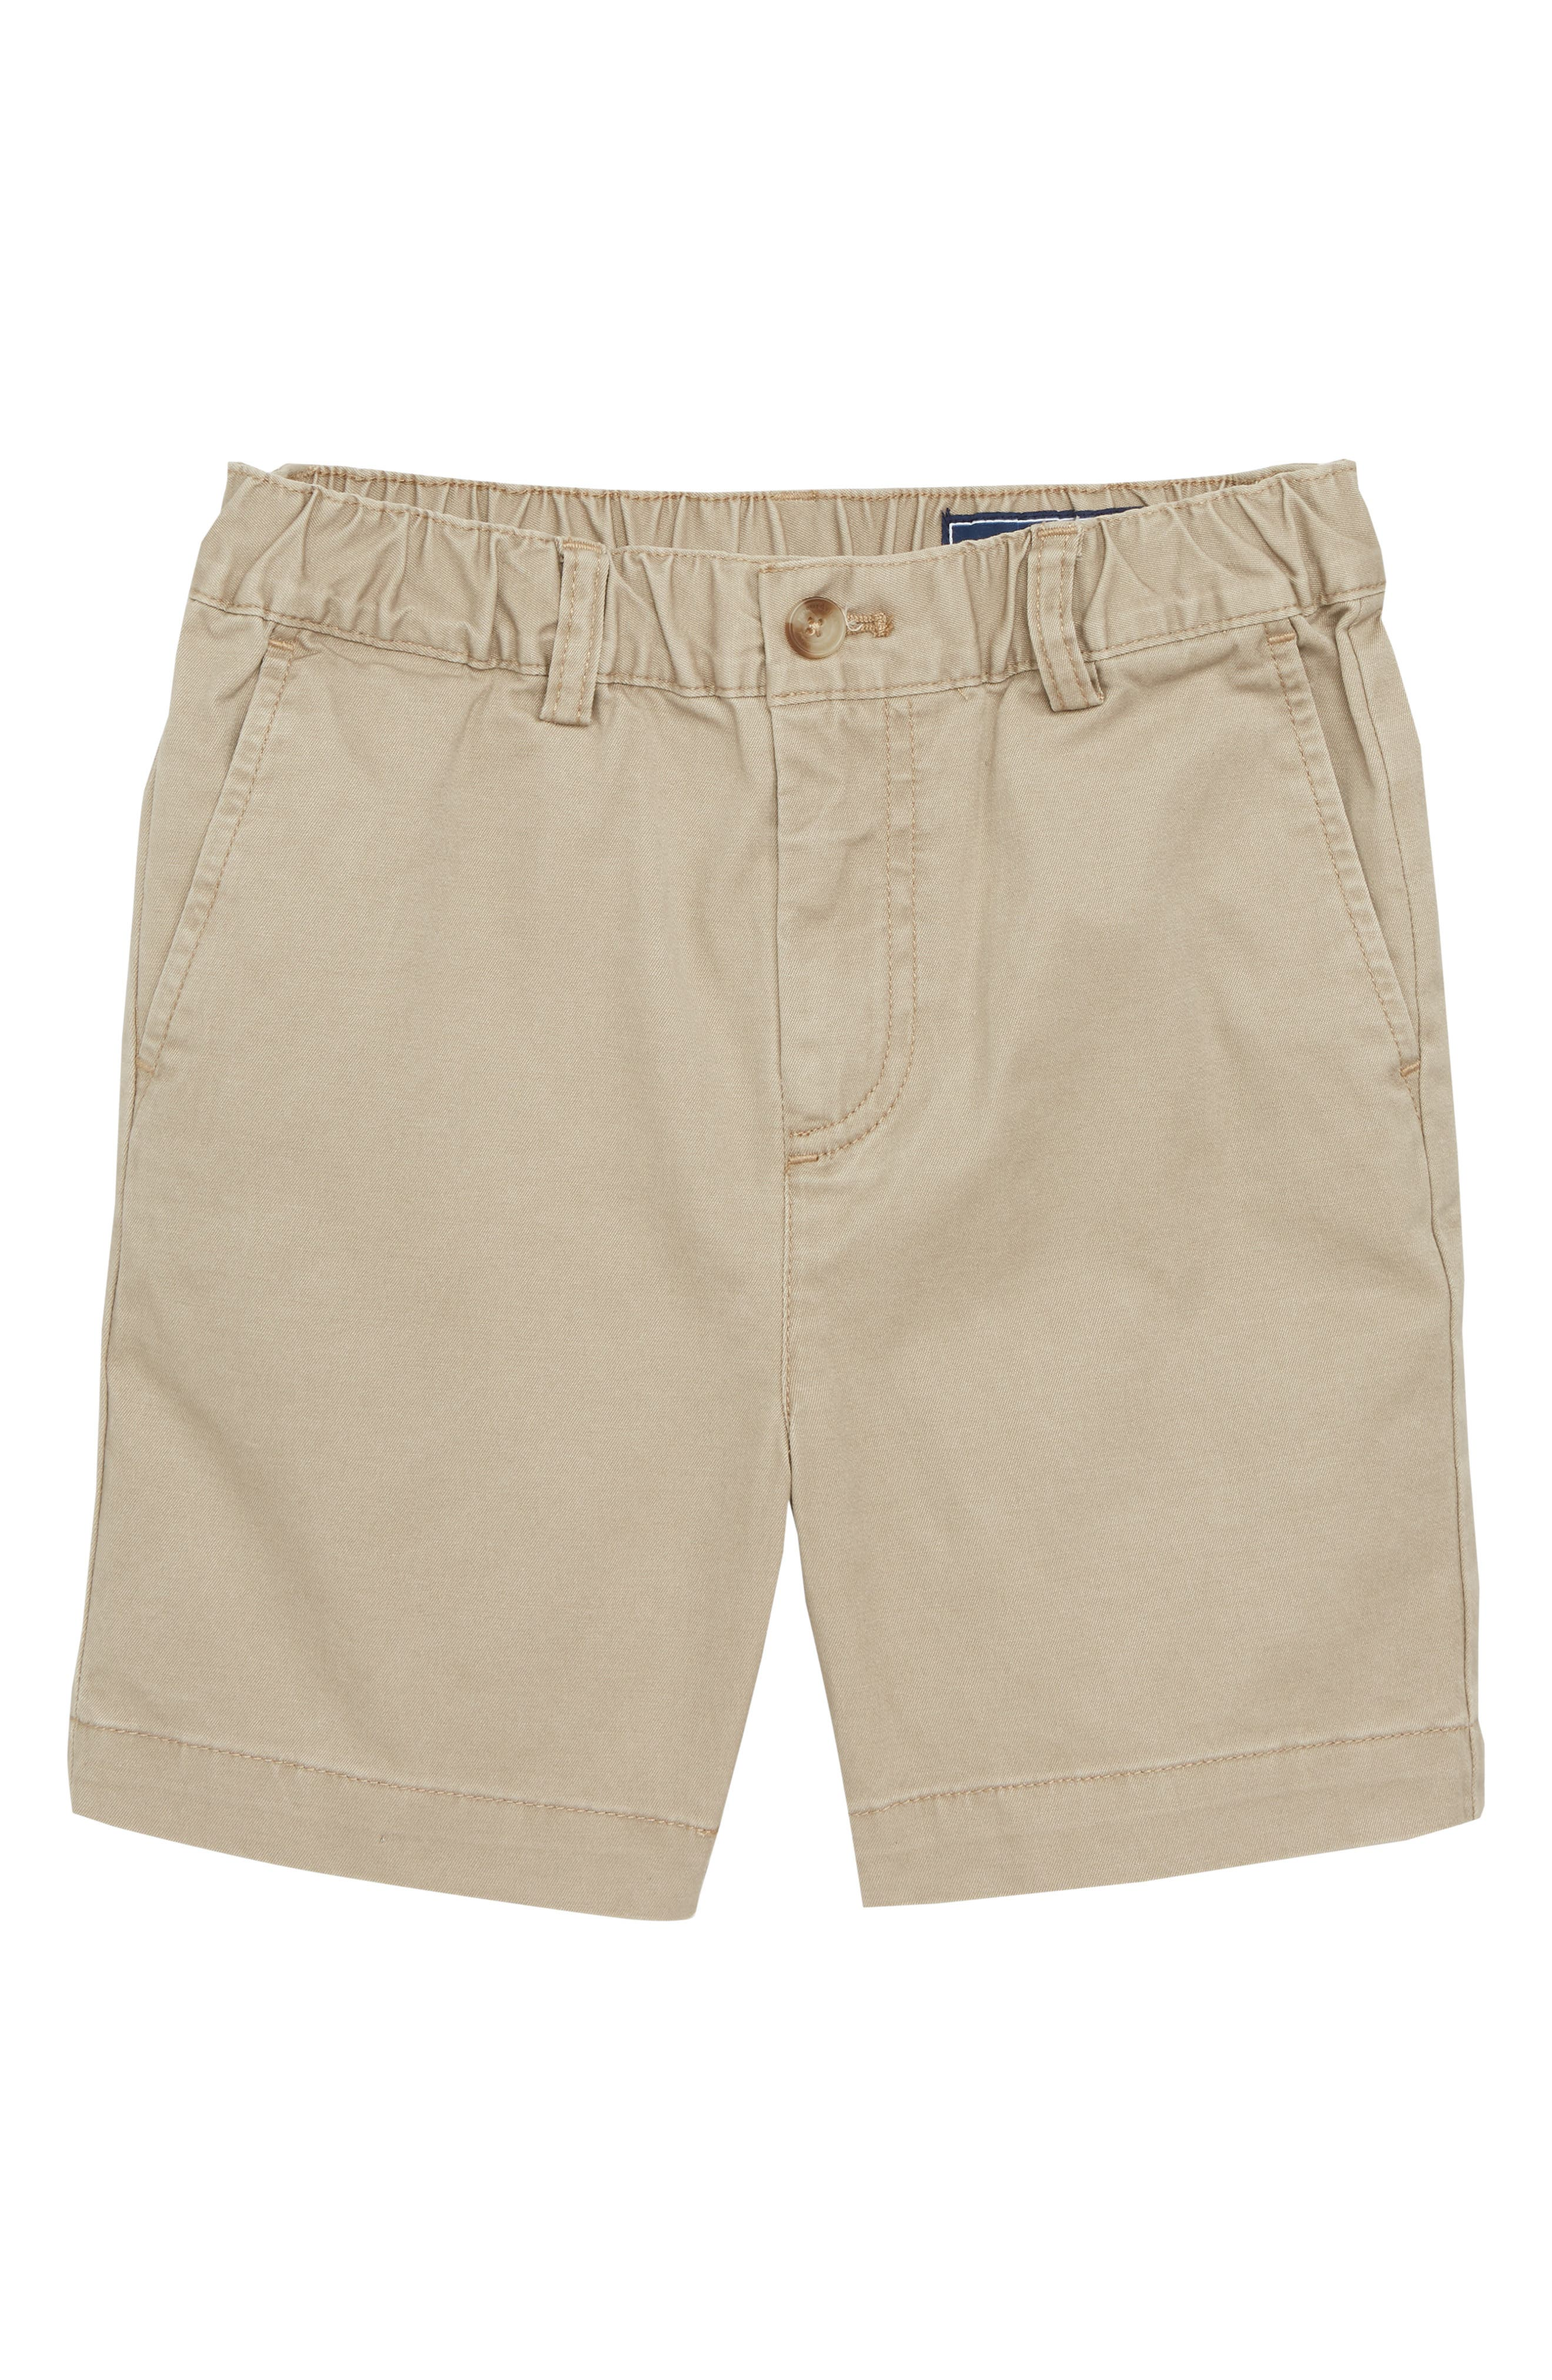 Stretch Jetty Shorts,                             Main thumbnail 1, color,                             Khaki